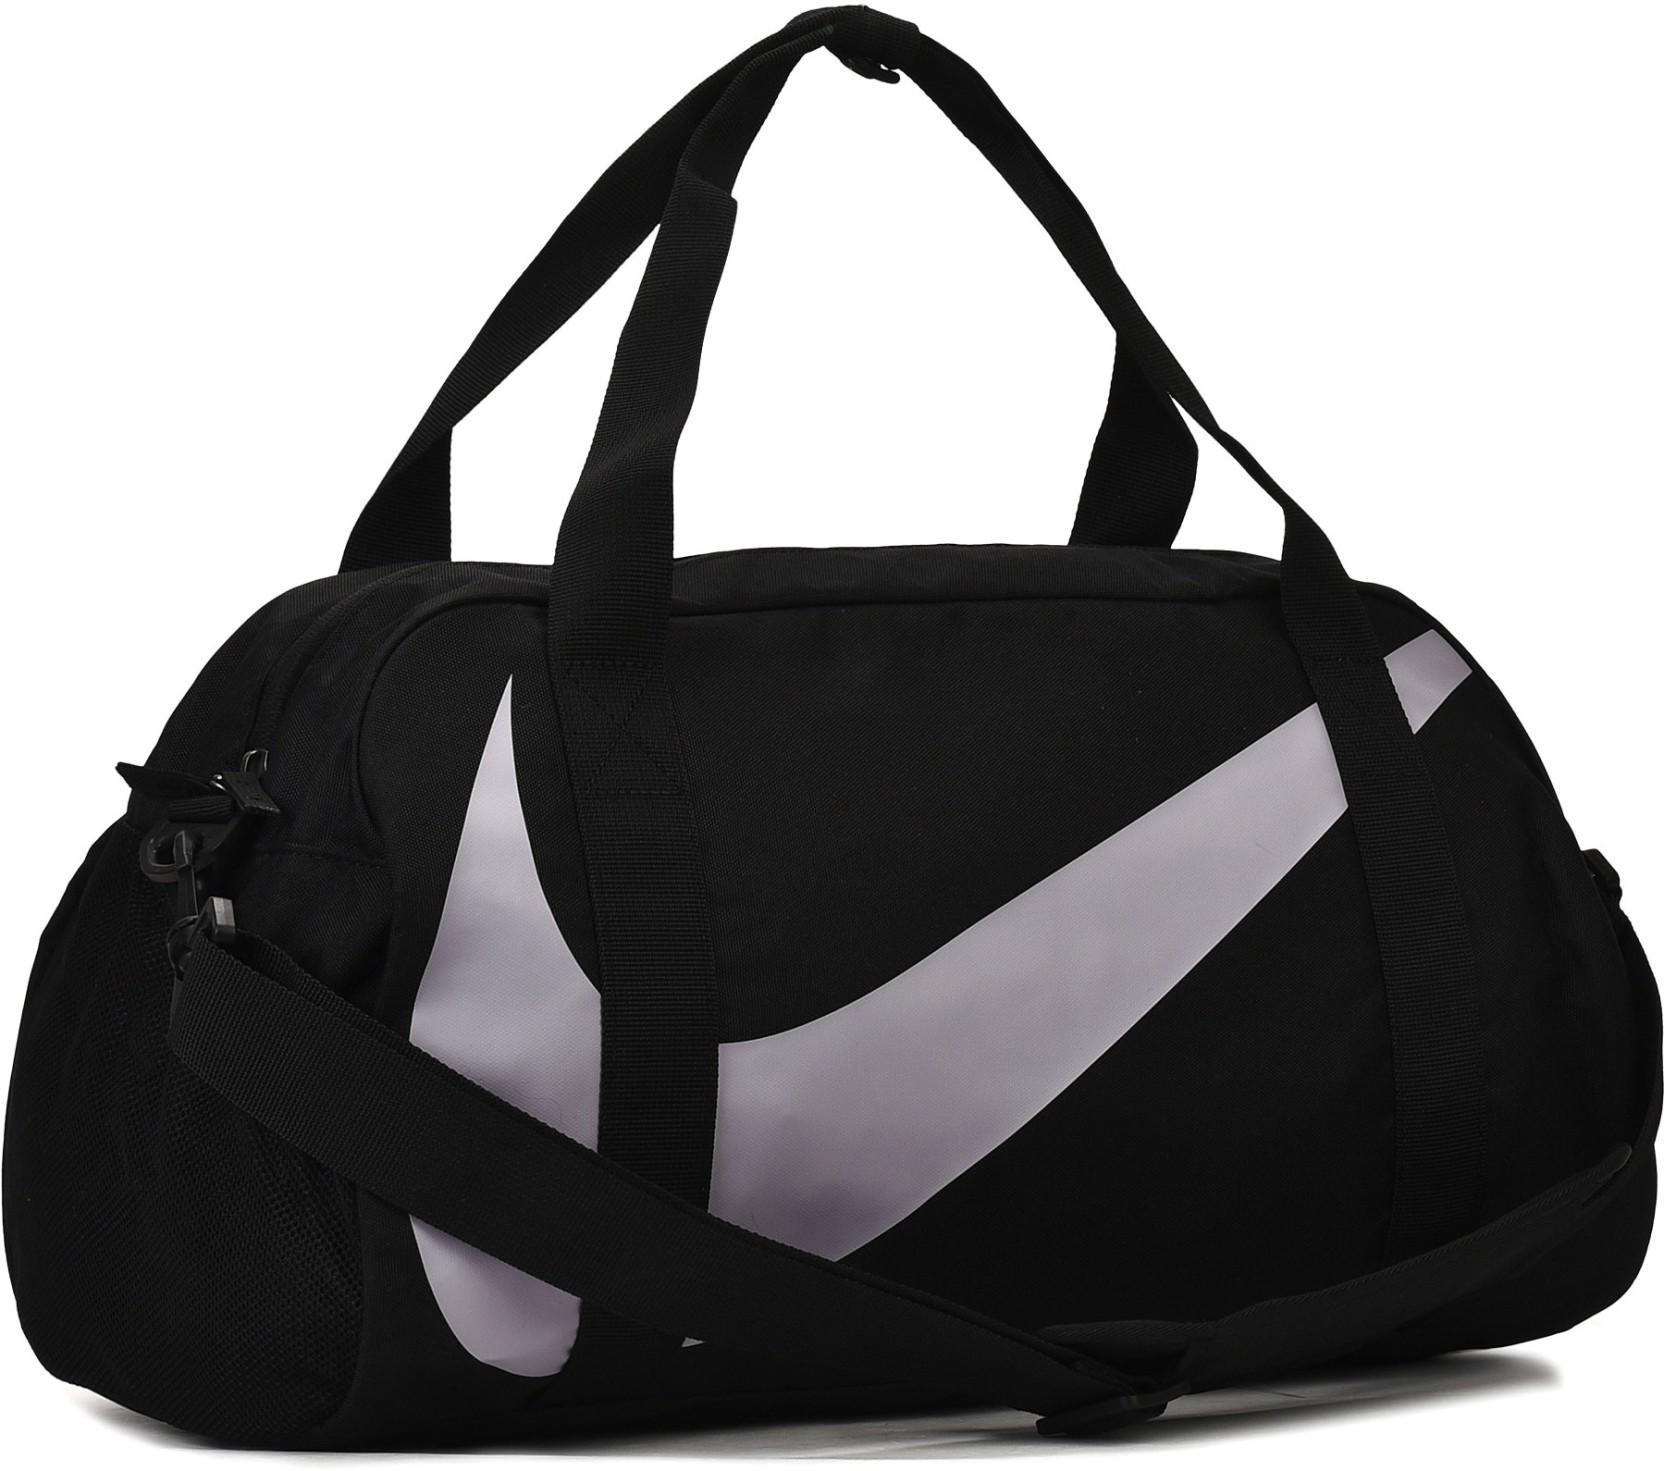 Nike club travel duffel bag black wolf grey price jpg 1664x1471 White nike  duffel bag 284260b561fb3